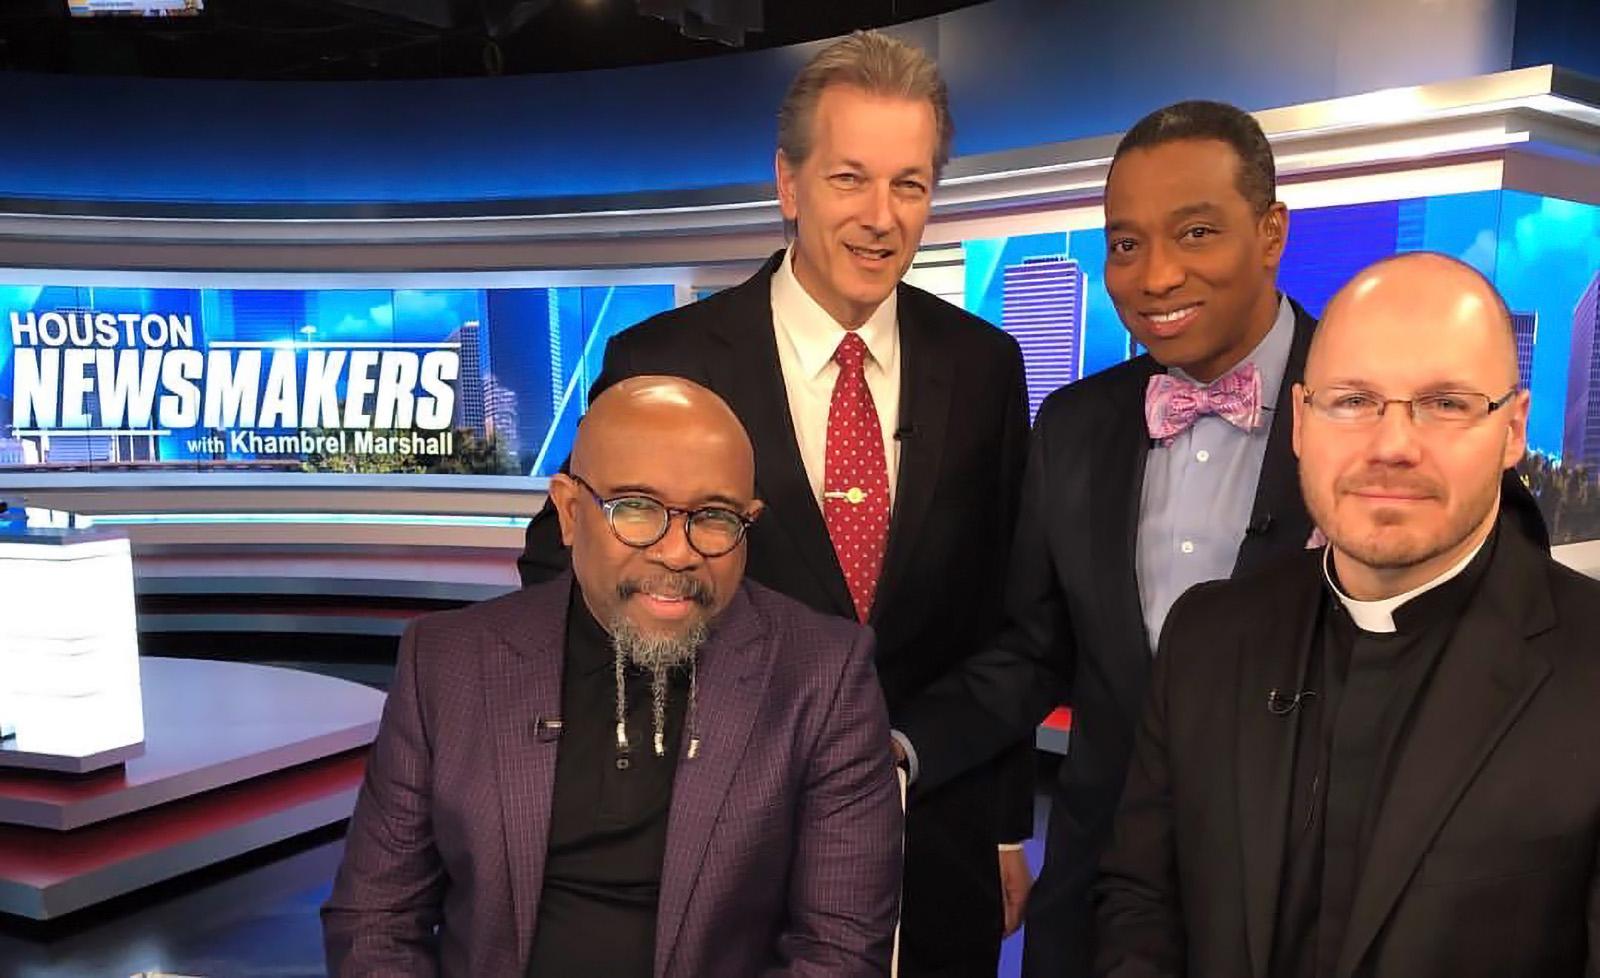 Click2Houston News Anchors Team